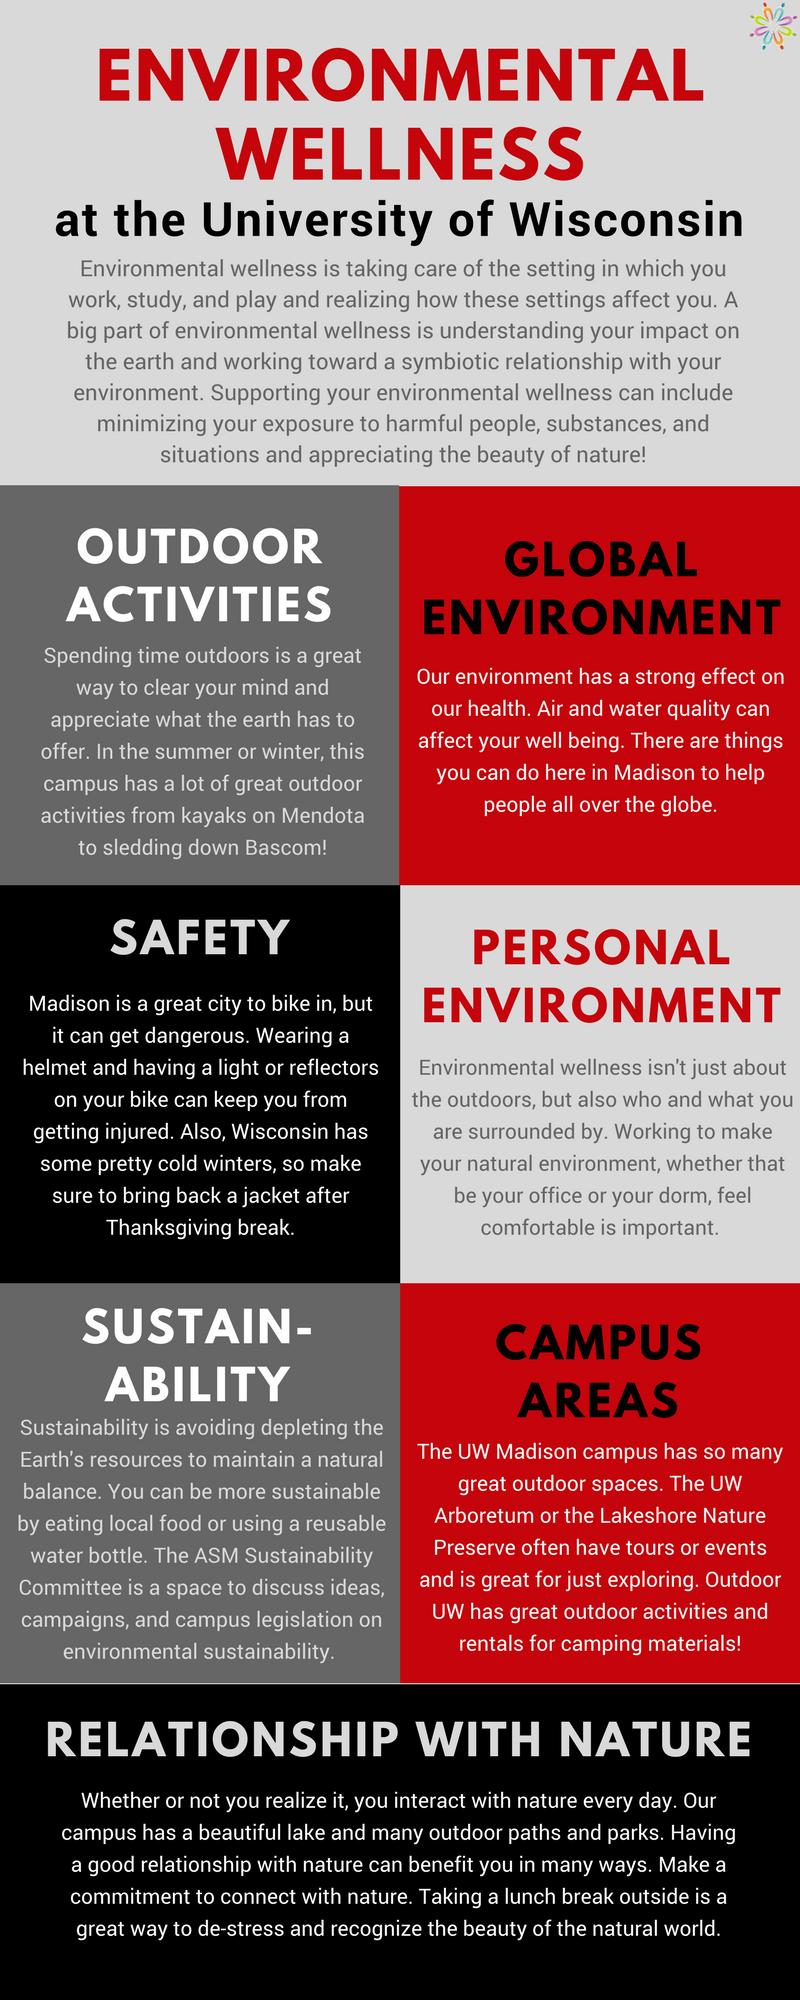 Environmental Wellness Uwell Uw Madison